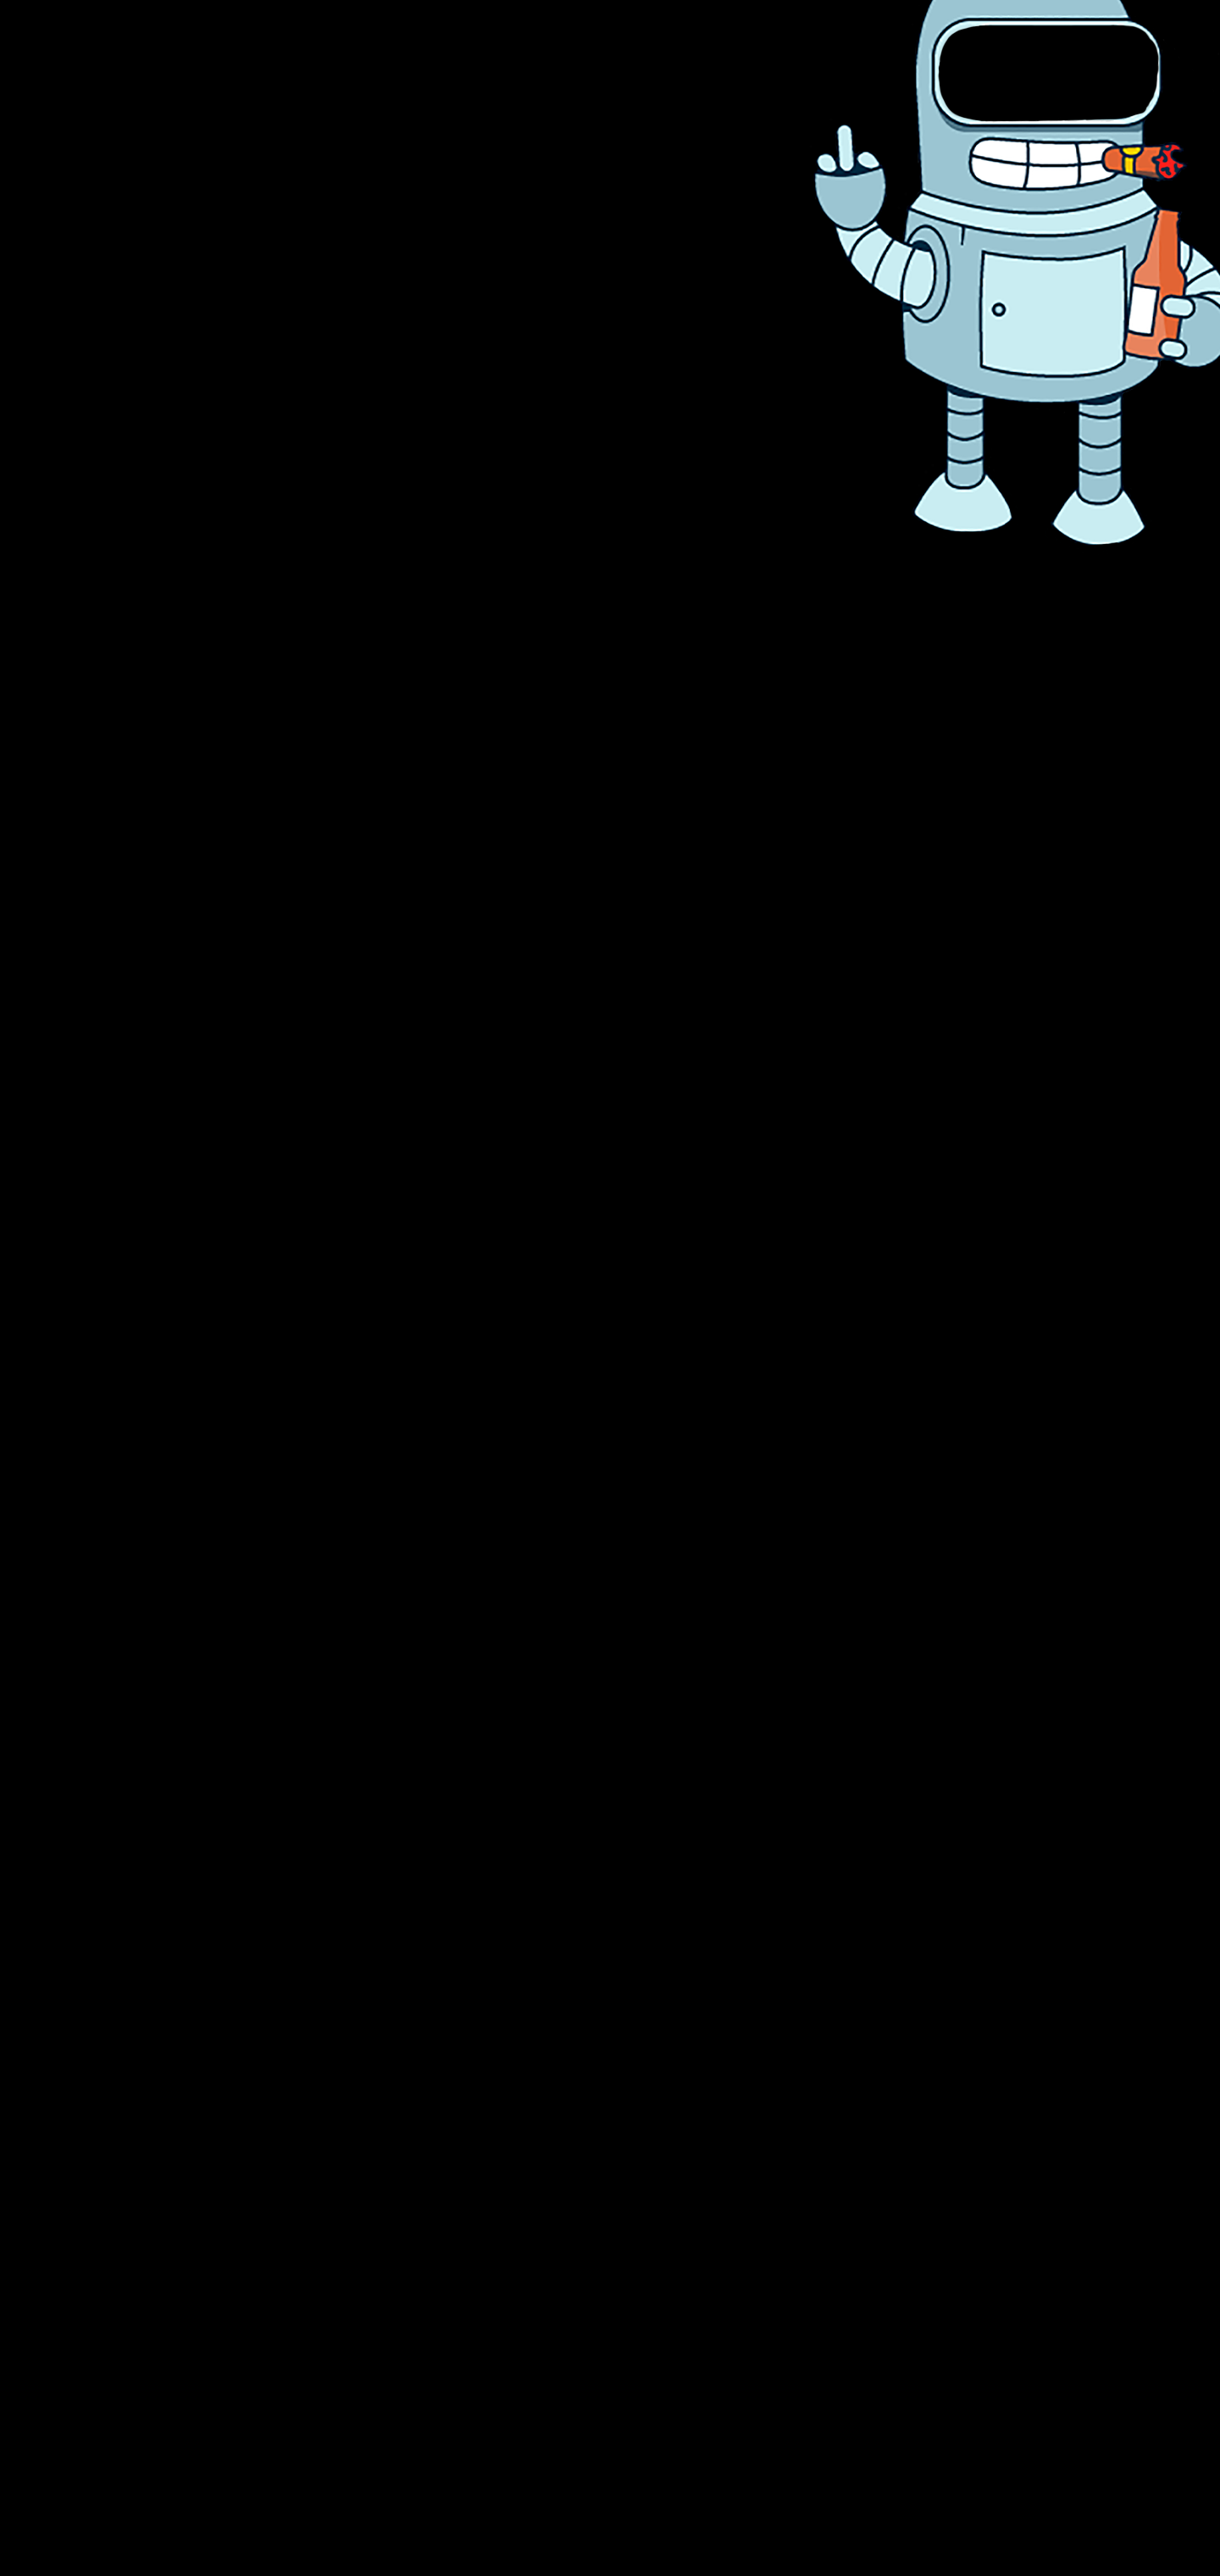 Oboi Wallpaper Dlya Samsung Galaxy S10 Plus S10 Galaxy Samsung Papel De Parede Galaxy Papel De Parede Samsung Samsung Papel De Parede